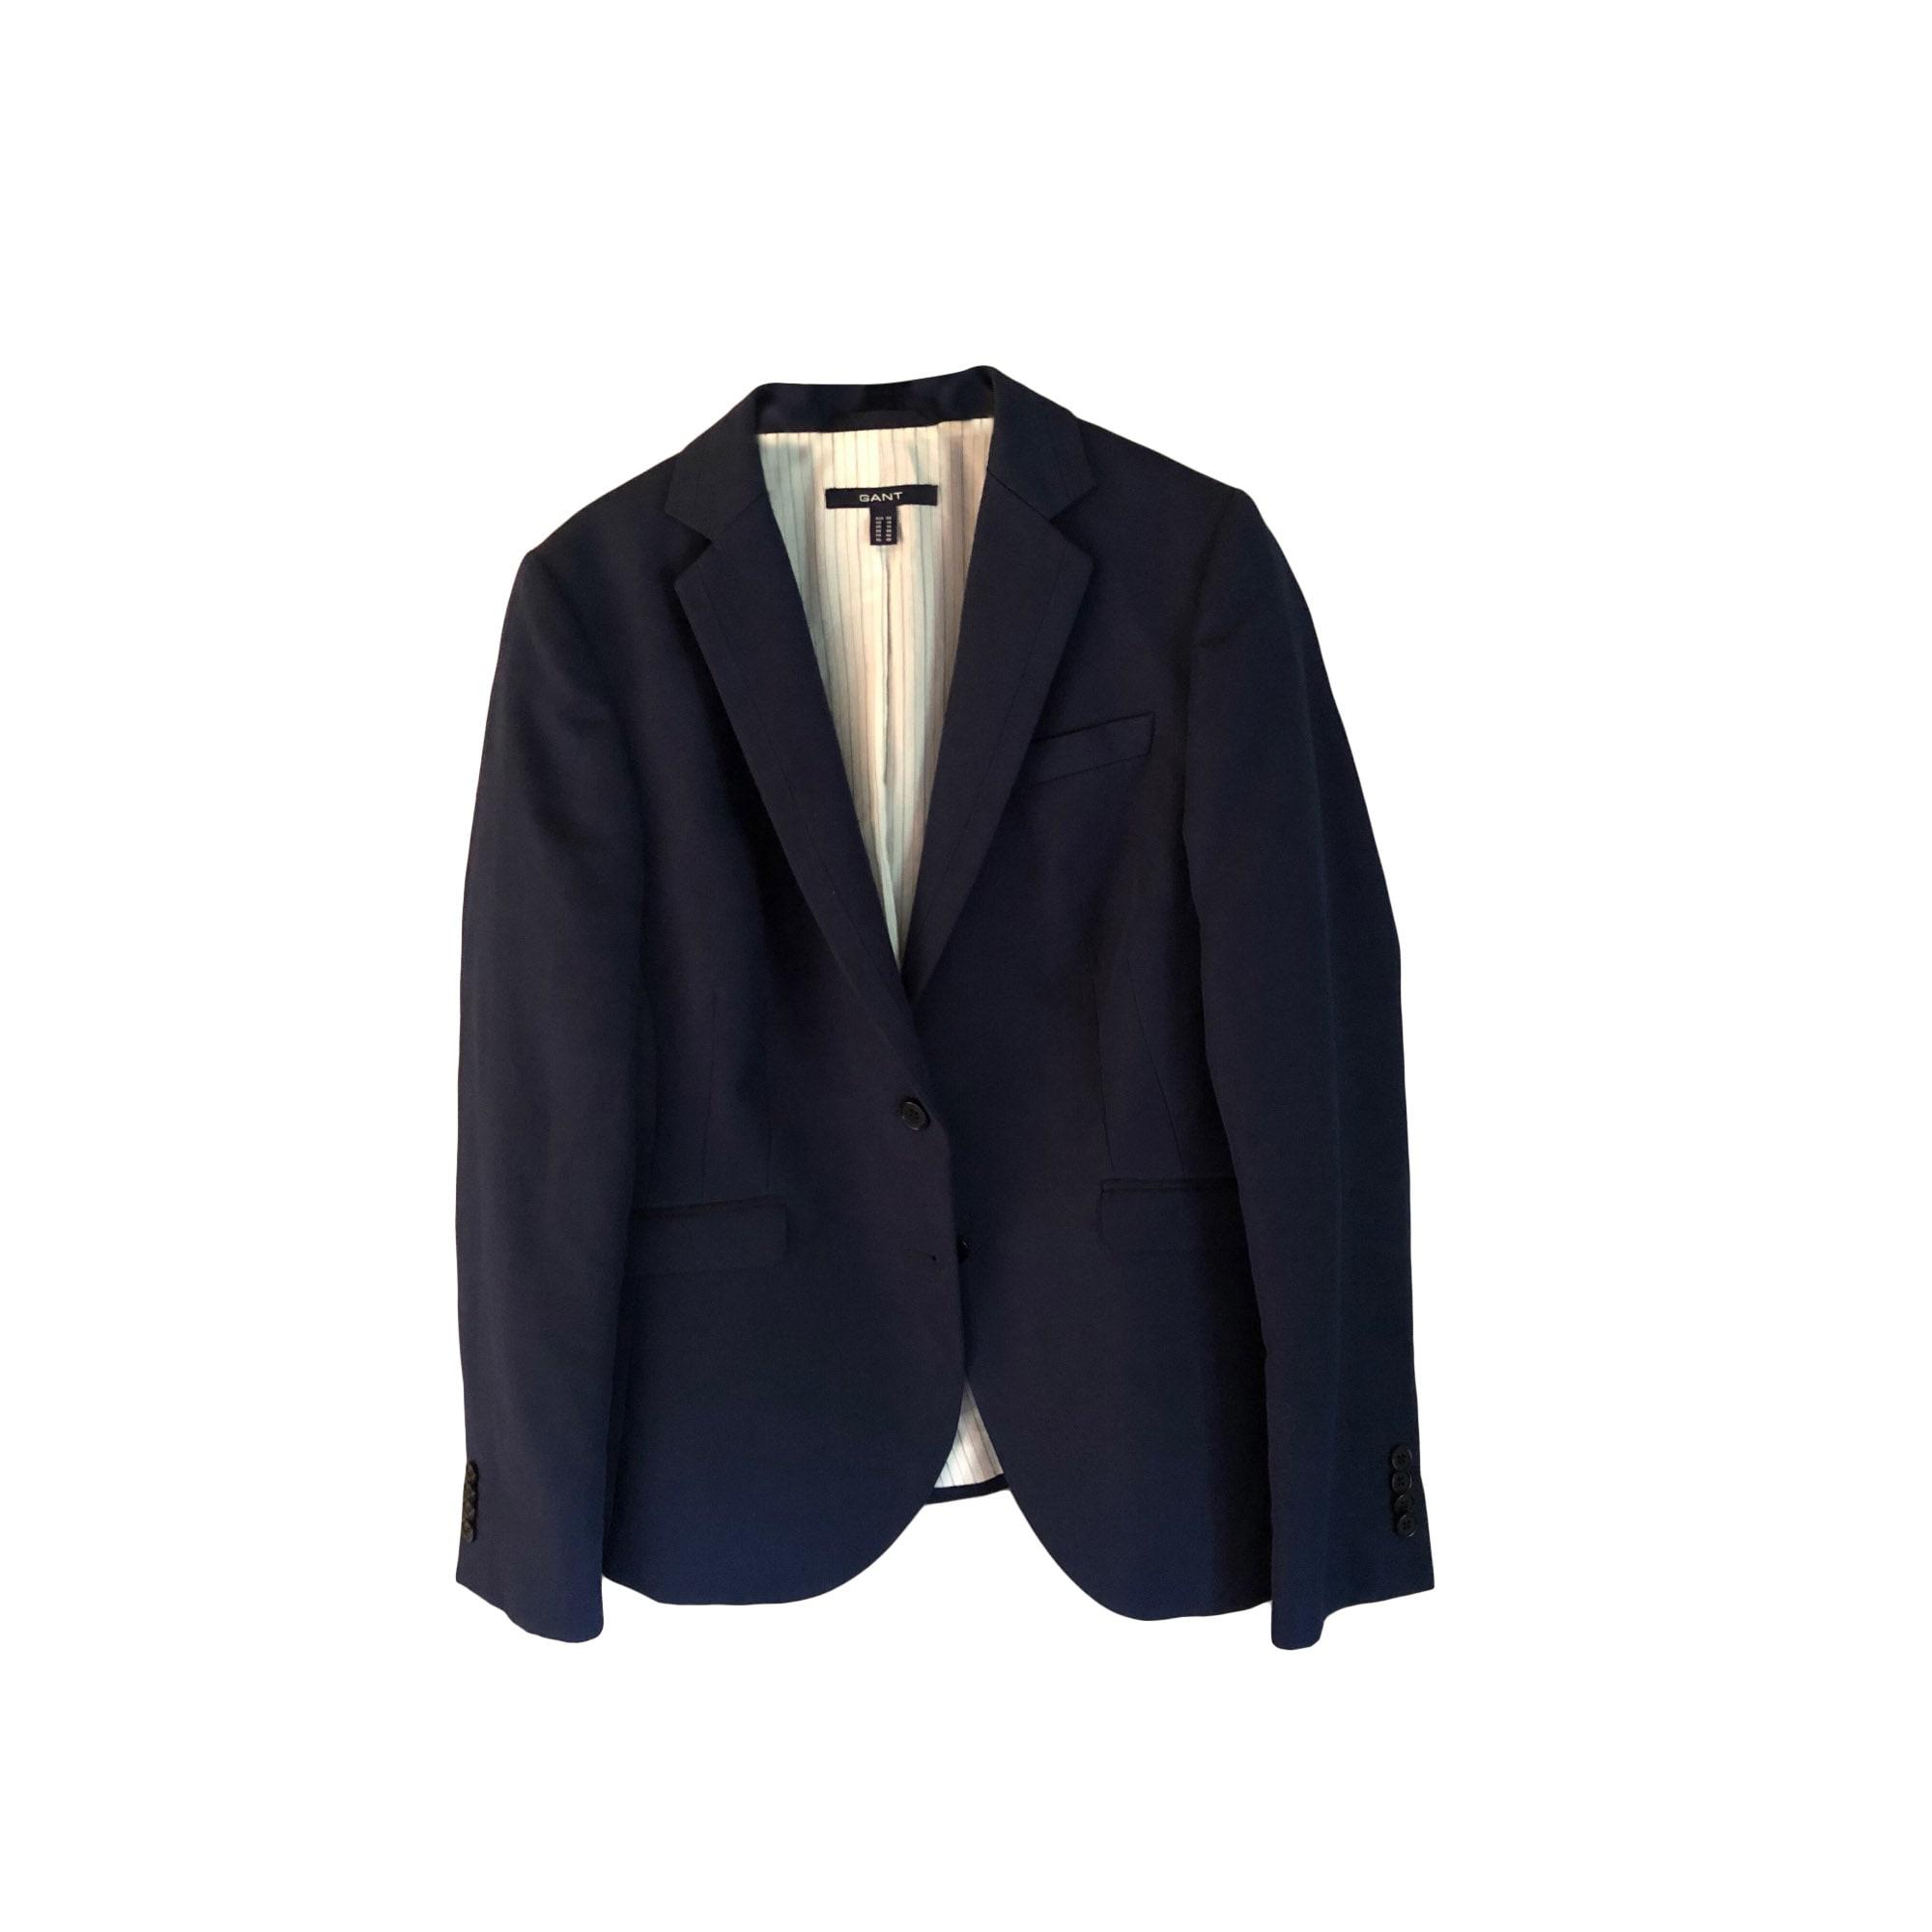 Gant Veste Blazer Tailleur l Bleu 40 7702086 T3 fAwwdxqE